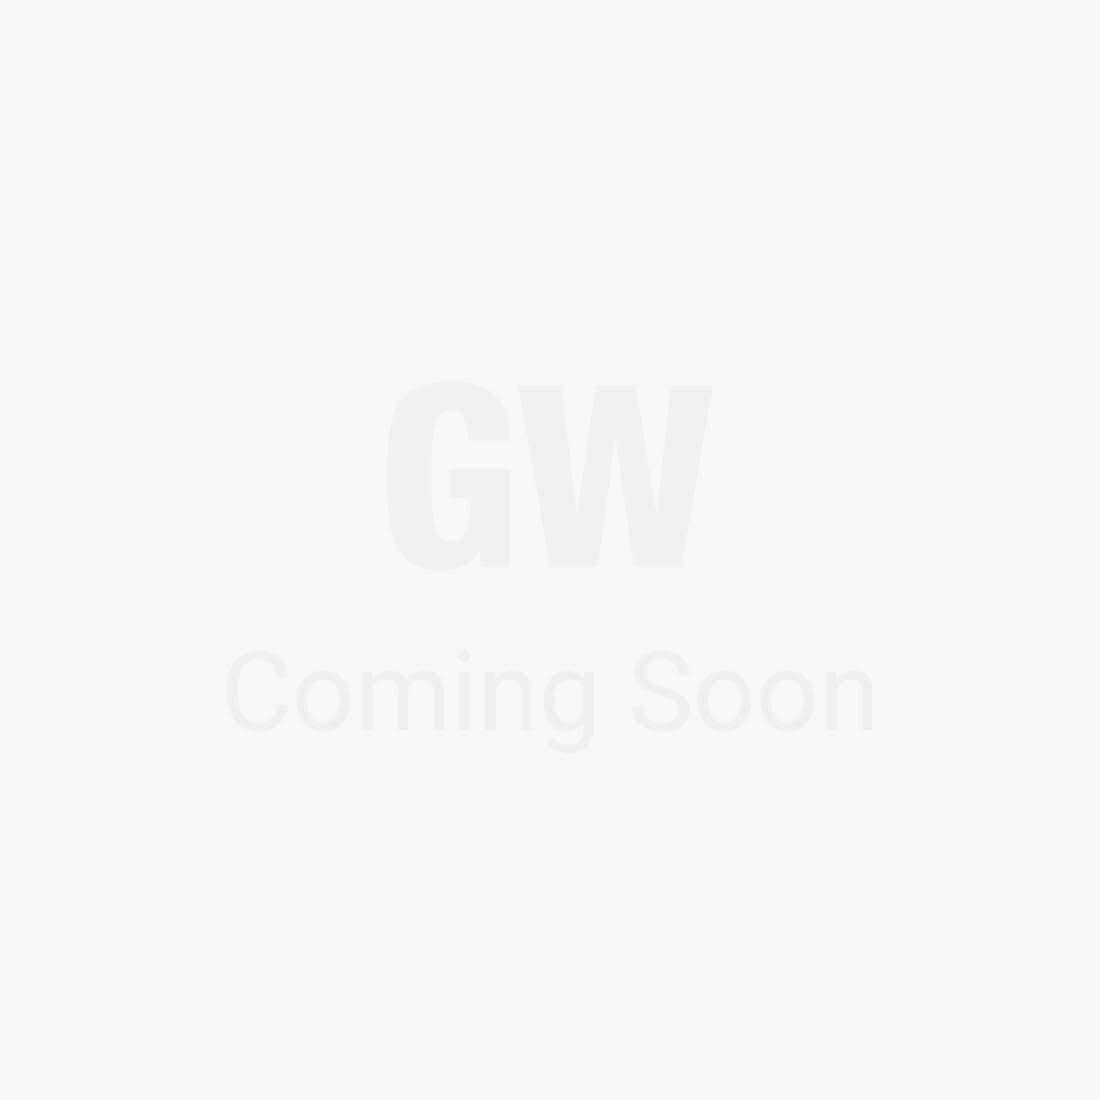 Woodland Bowl Low Stool